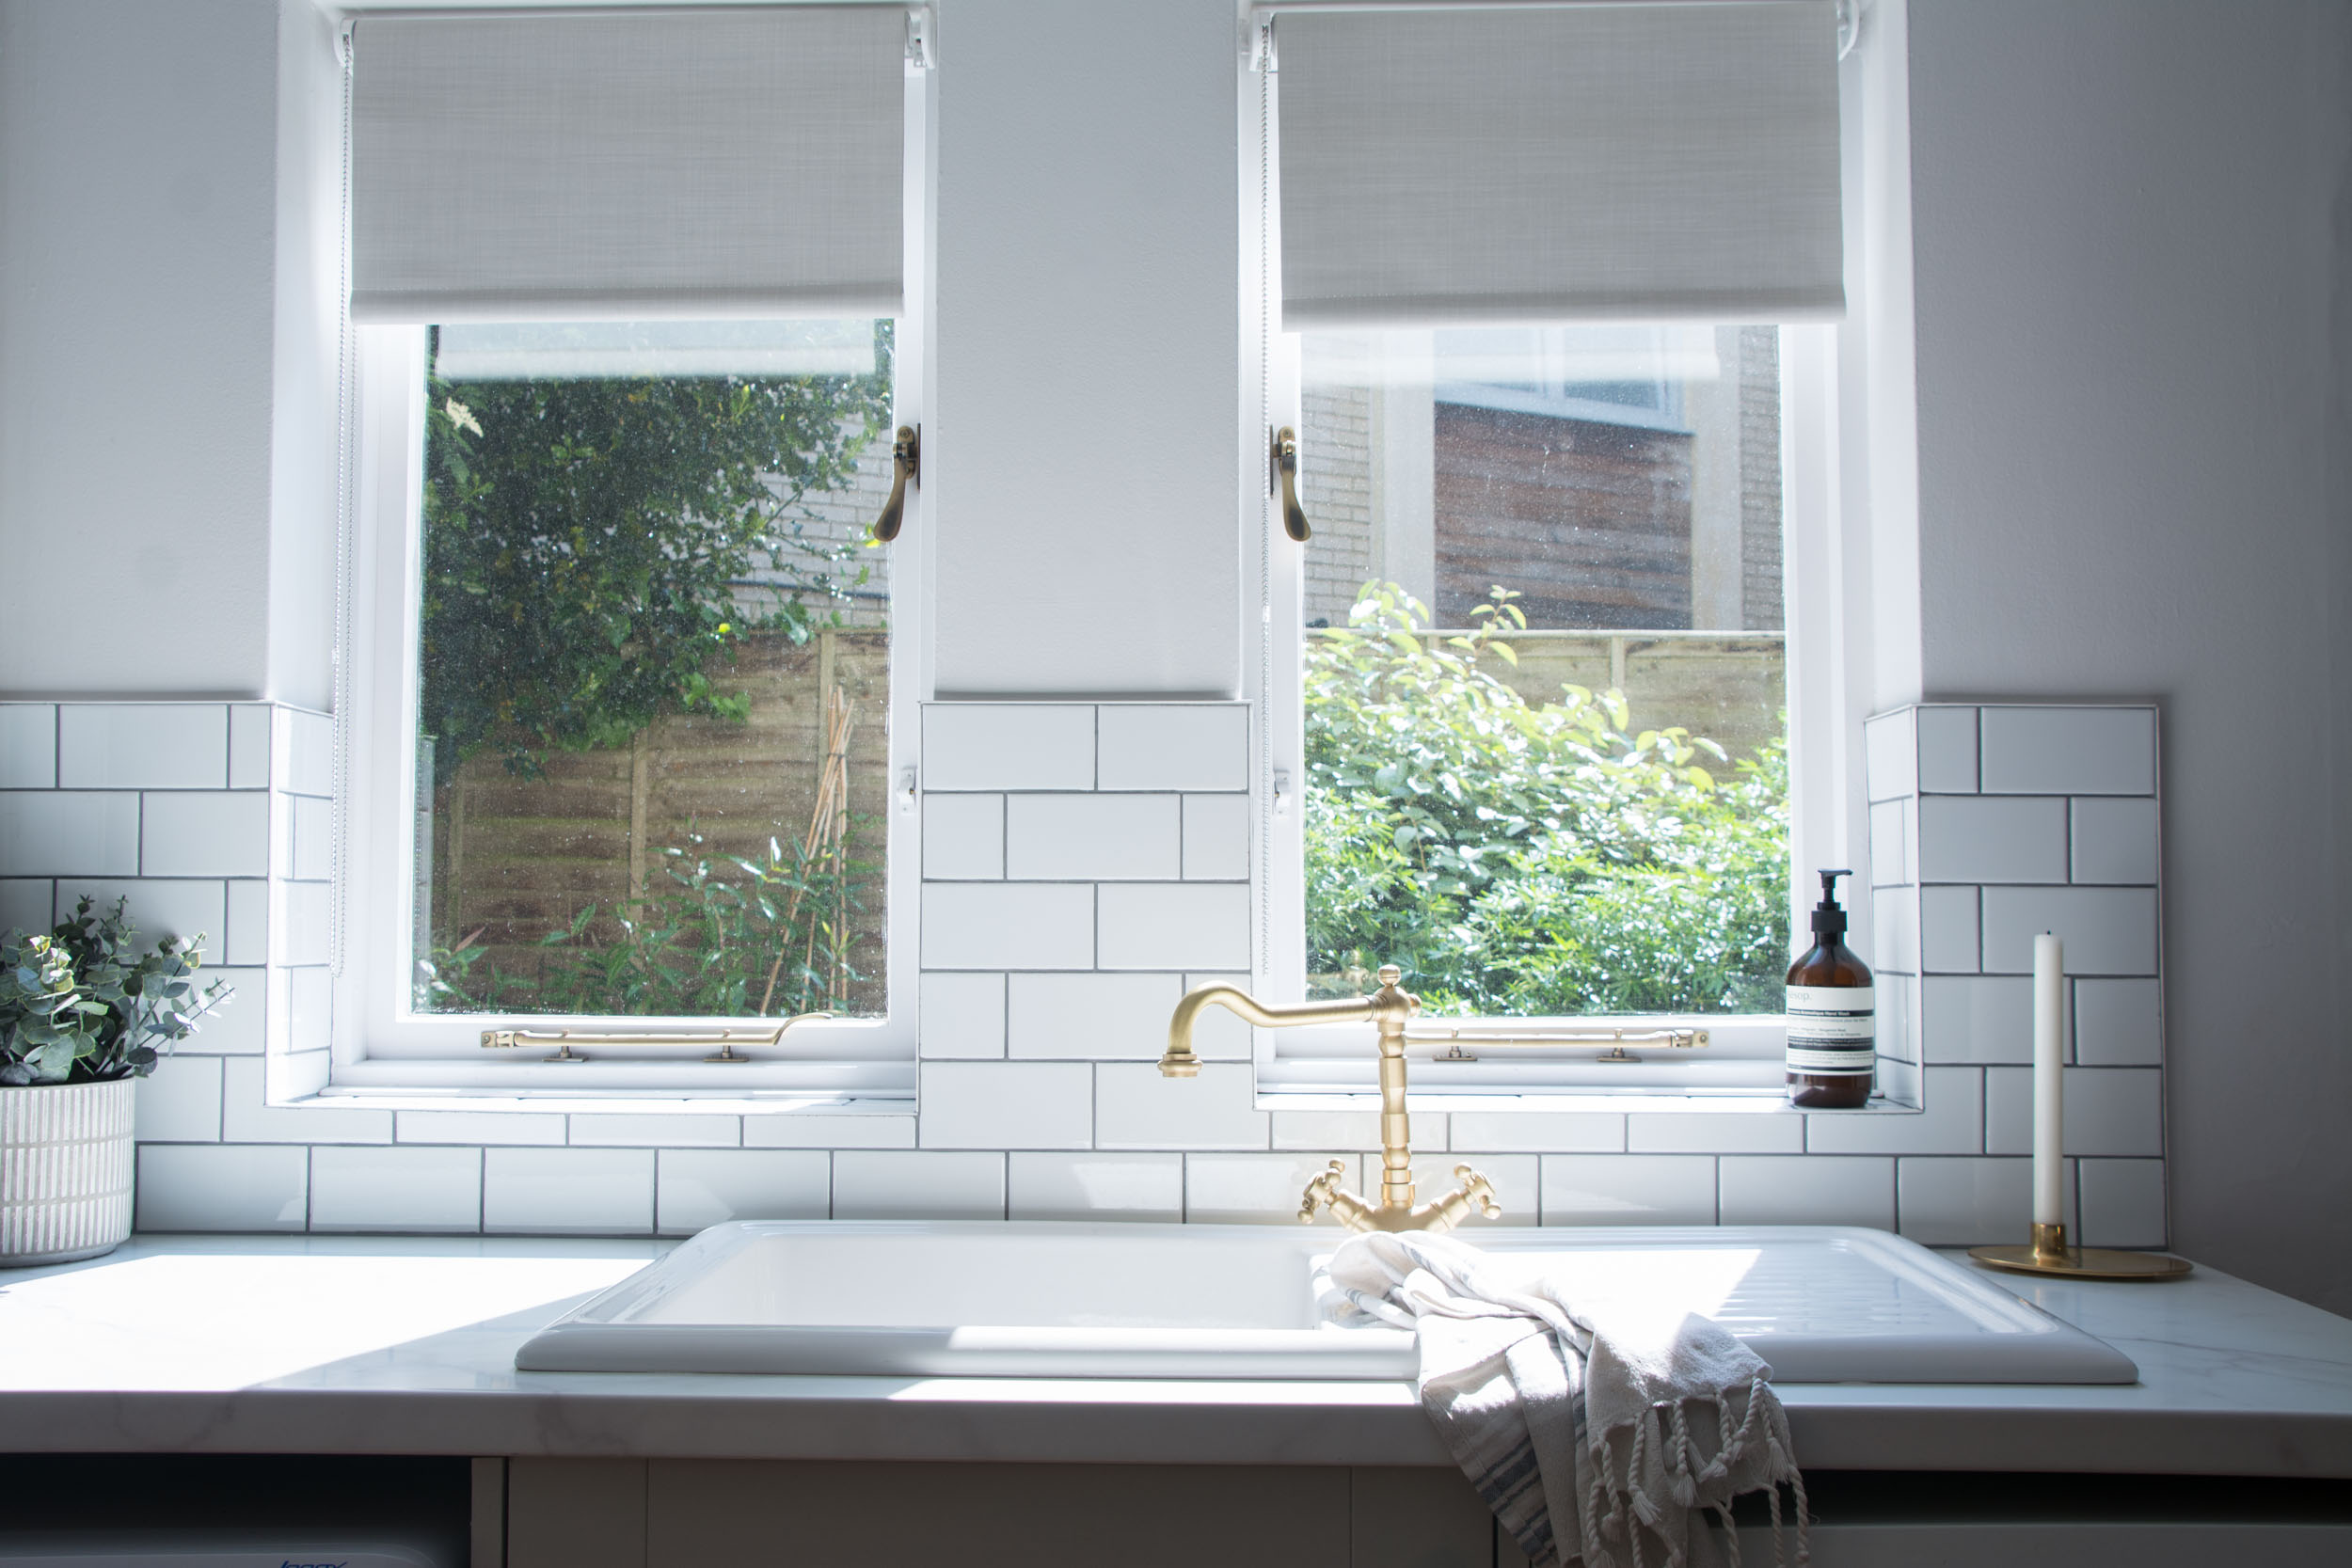 parsons-gray-interior-design-montague-road-4.jpg